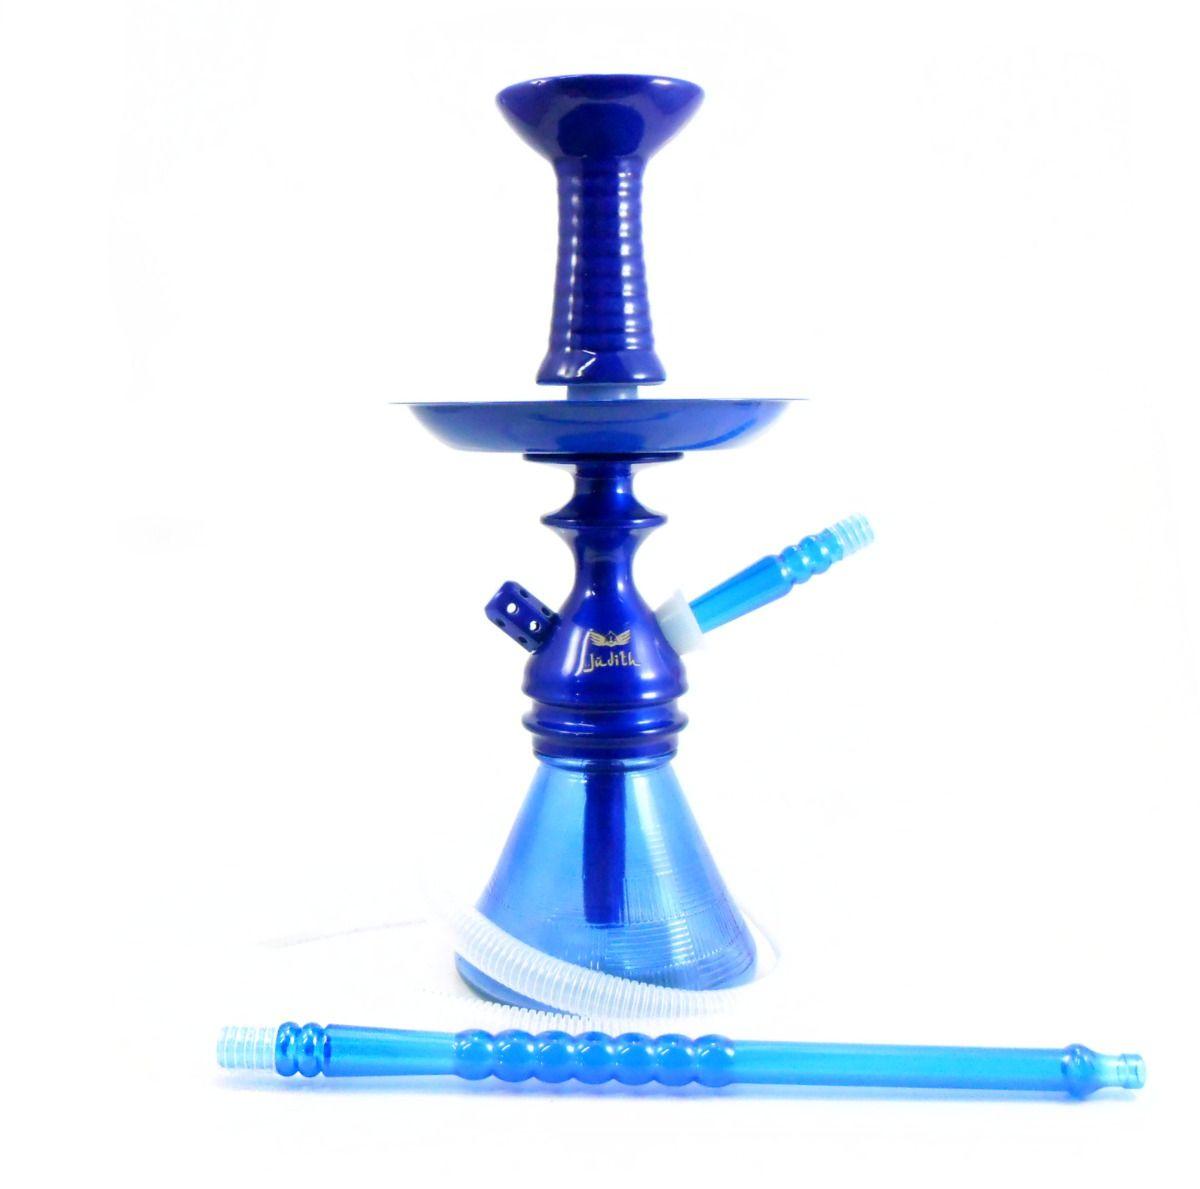 Narguile JUDITH AZUL METÁLICO 33cm, vaso Petit AZUL, mangueira lavável, fornilho Flux Bowl Azul e prato pintado.